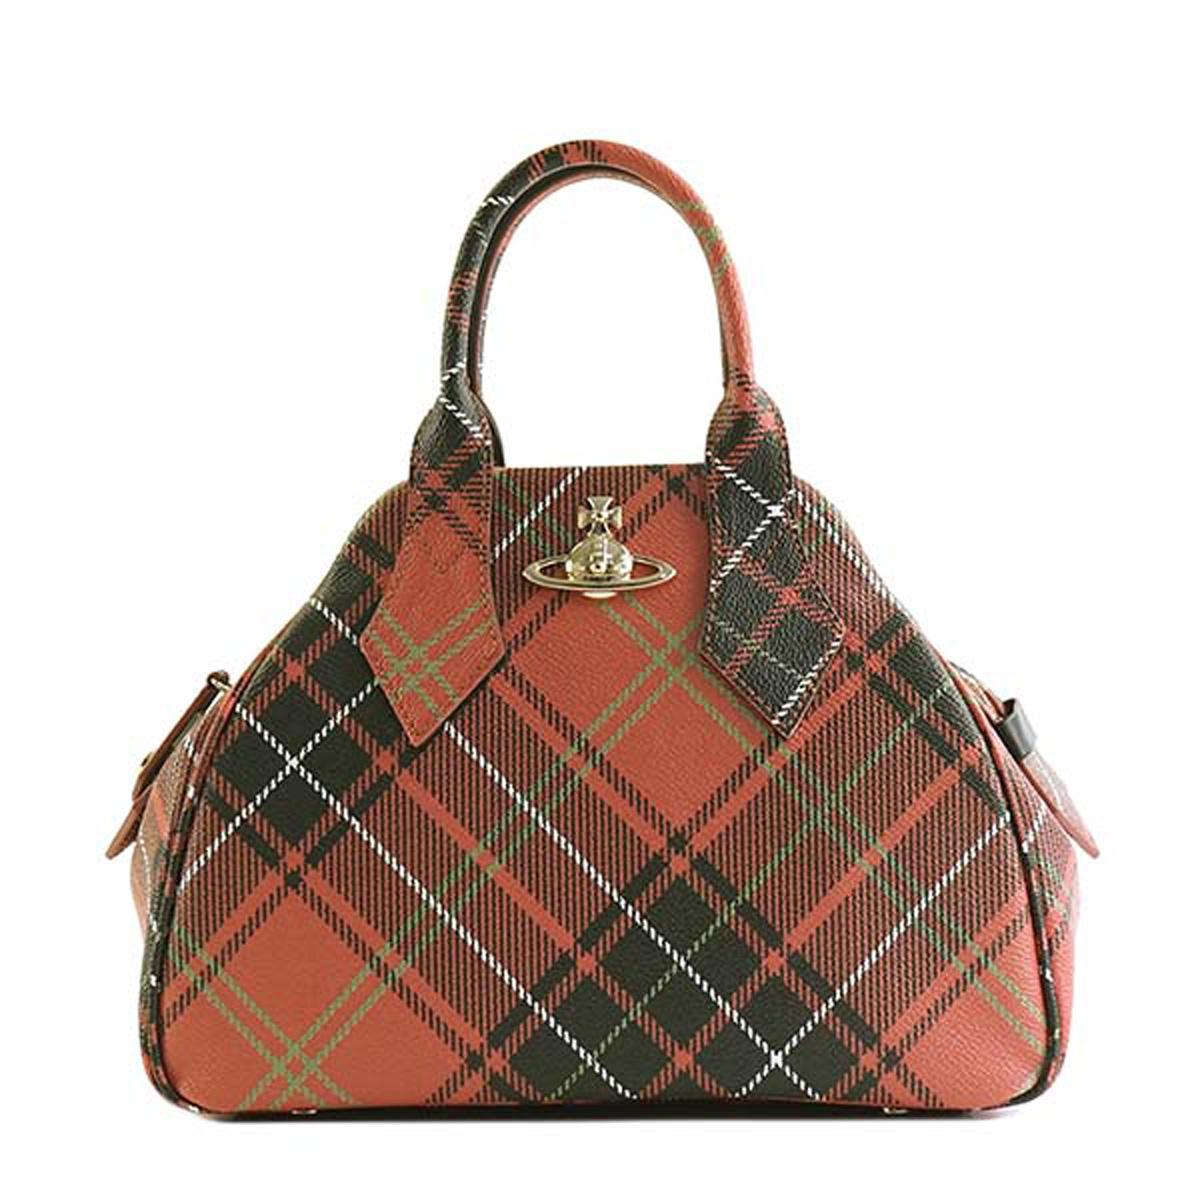 2faddb12fc Vivien waist Wood Vivienne Westwood 45020001 DERBY MEDIUM Derby medium handbag  CHARLOTTE red system tartan checked ...